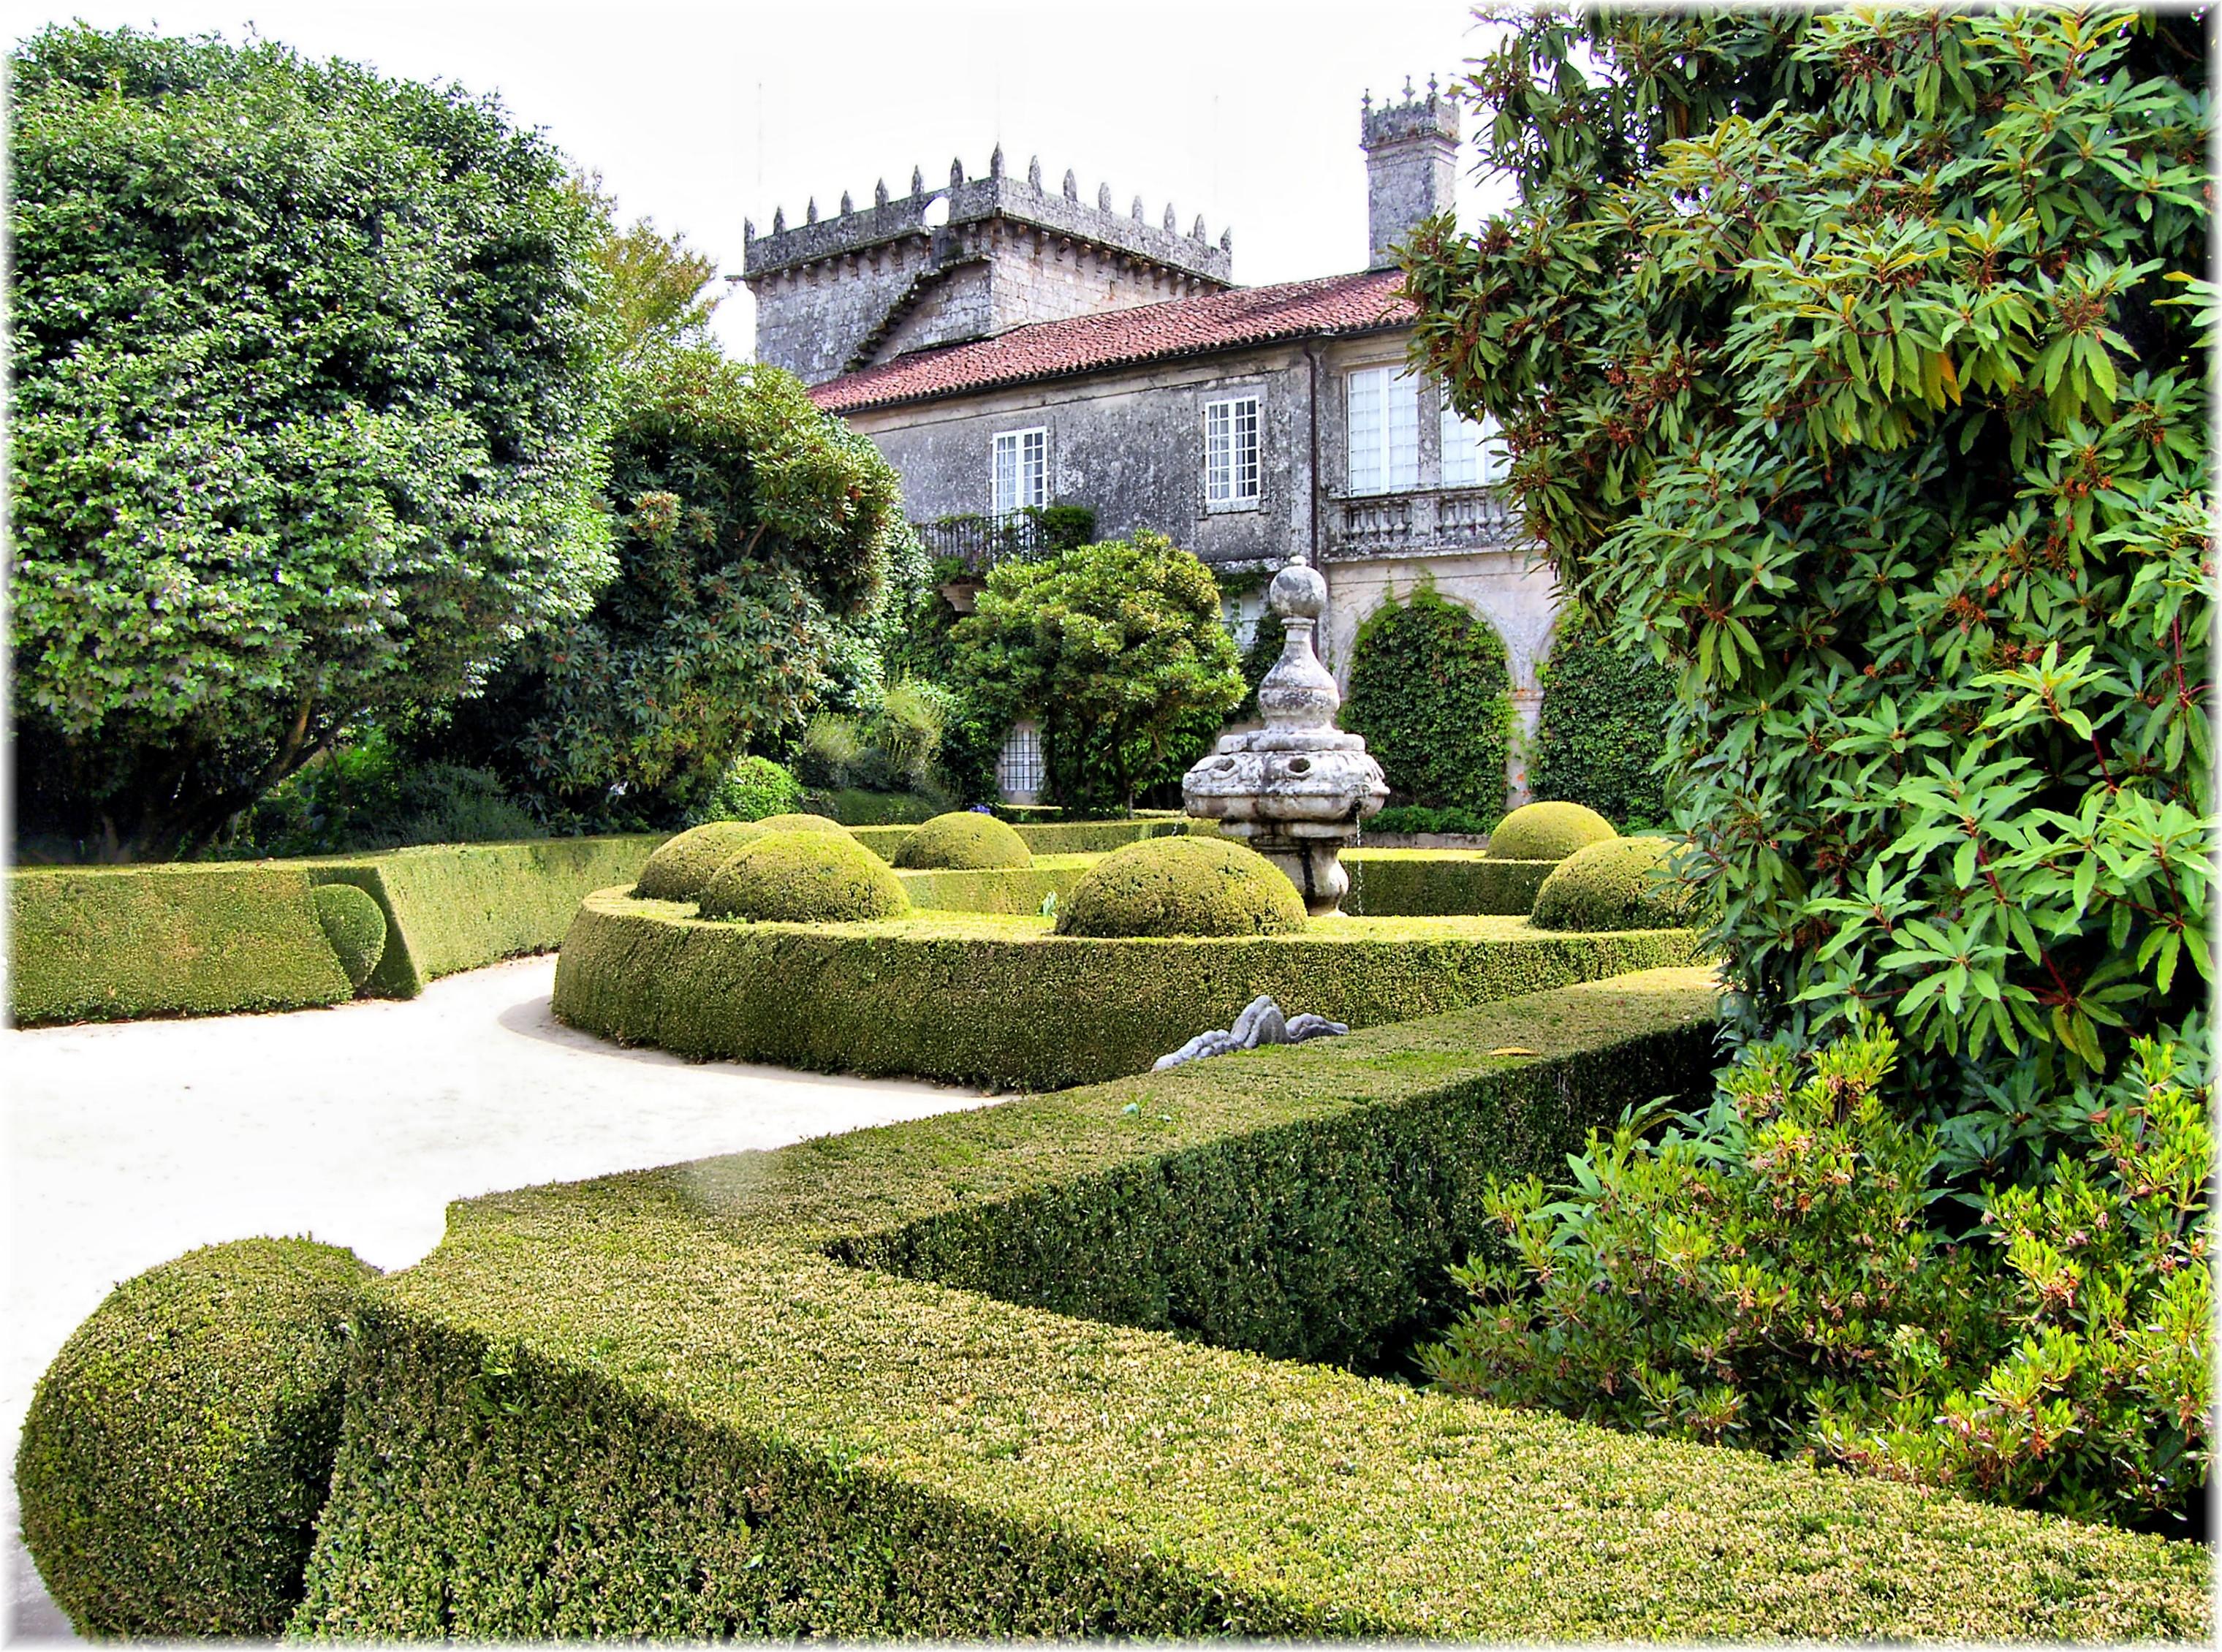 Fotos gratis c sped palacio casa europa patio interior bot nica espa a espagne - Disenador de casas gratis ...